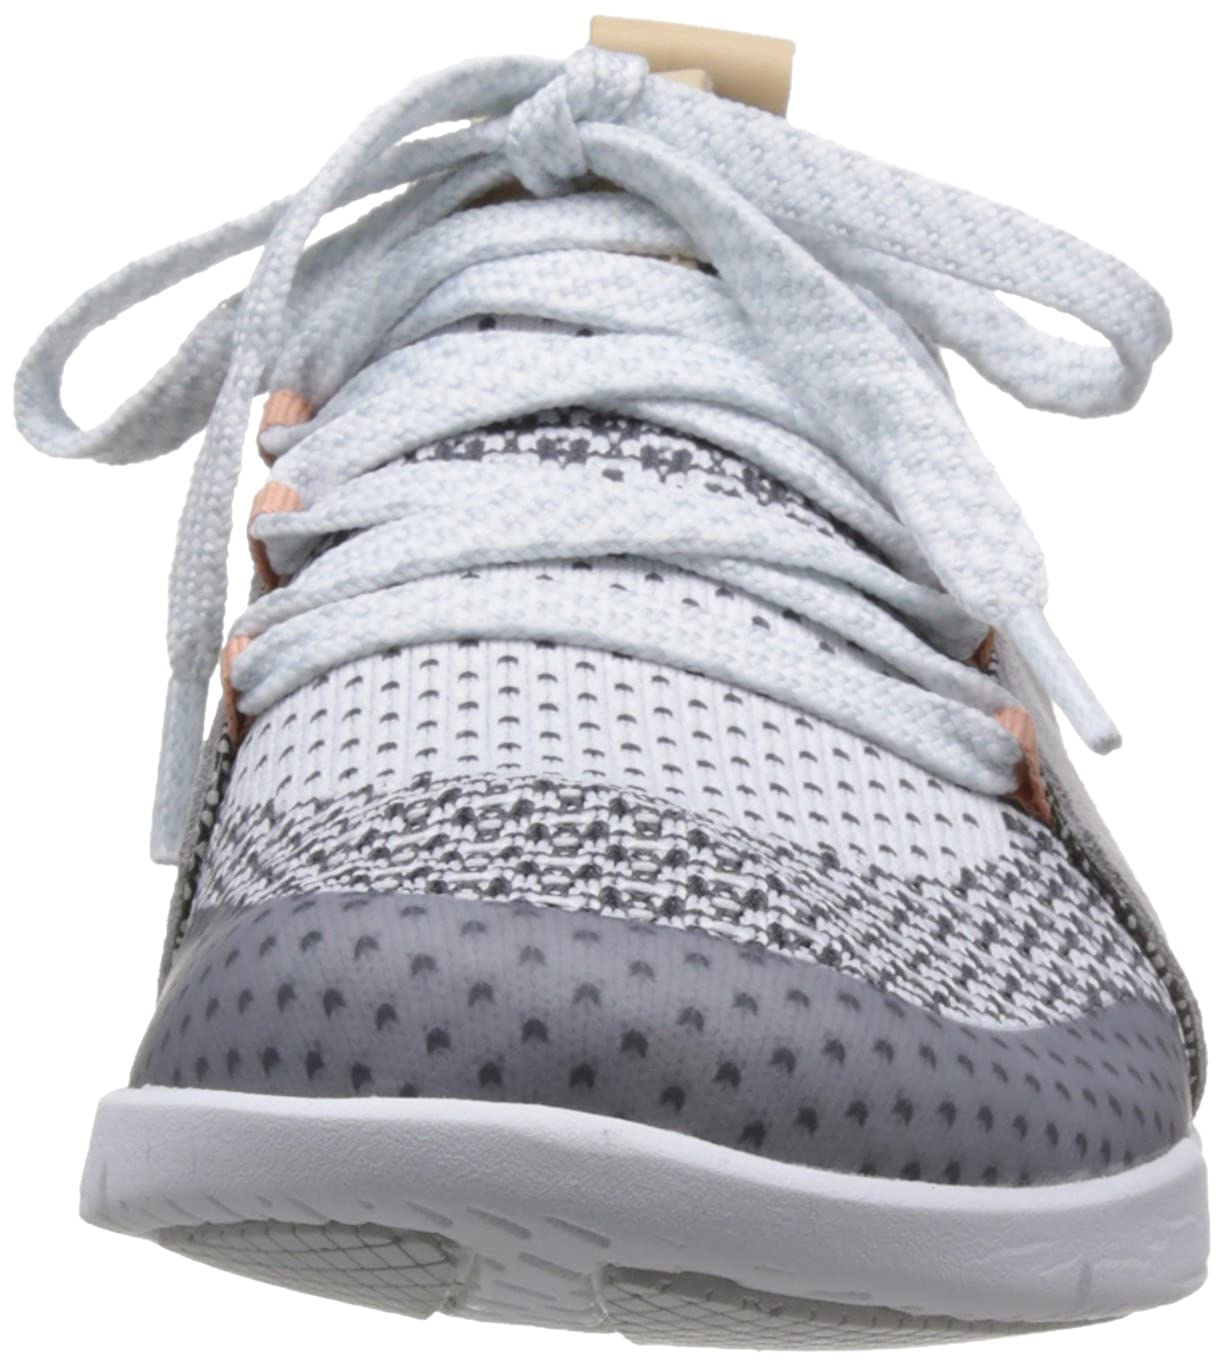 600dd63db6dd Clarks Damen Tri Amelia Sneaker  Clarks  Amazon.de  Schuhe   Handtaschen